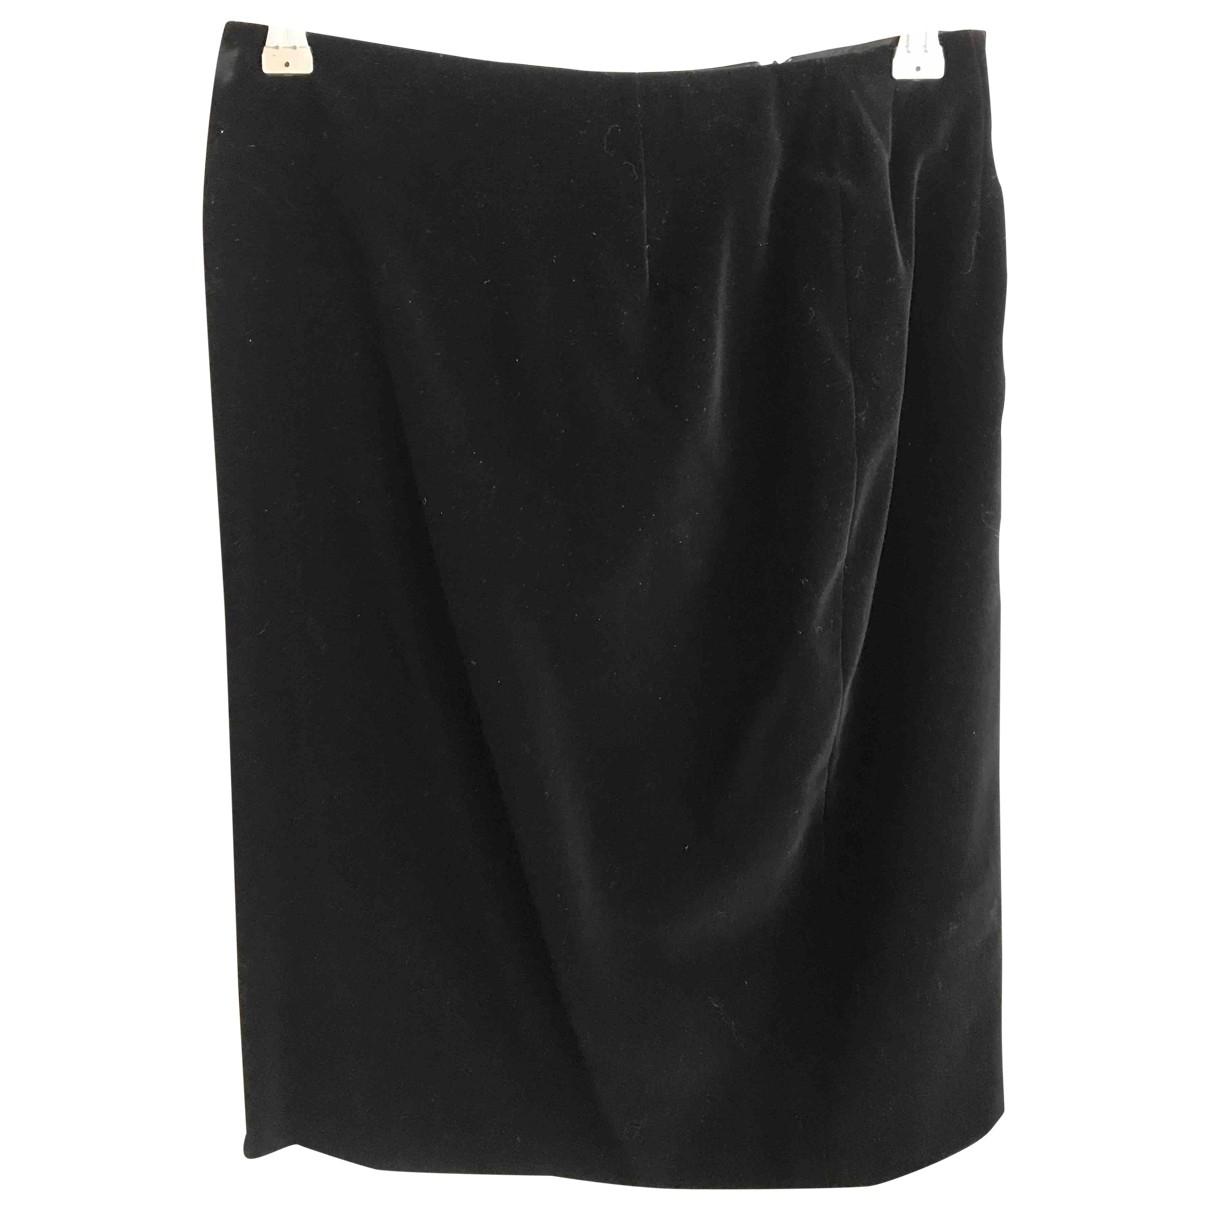 Escada - Jupe   pour femme en coton - noir